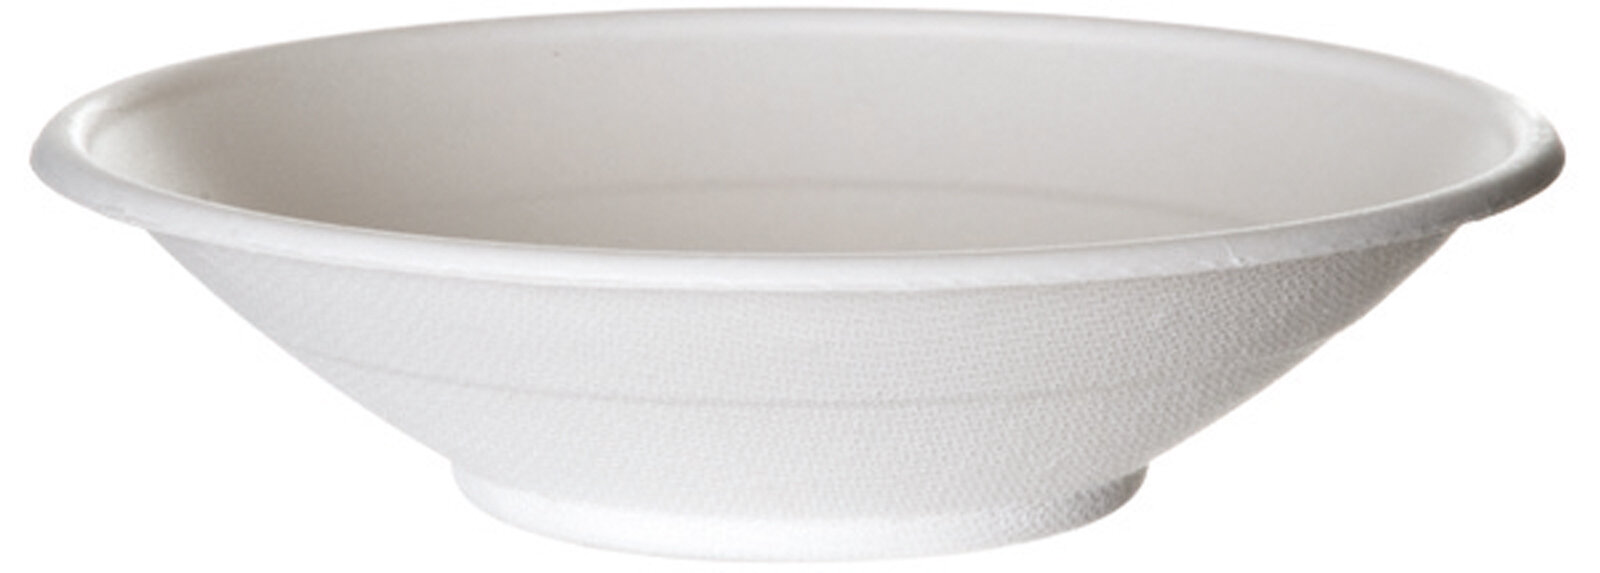 Biodregradable Noodle Bowl & Lid 710ml (Box of 400)